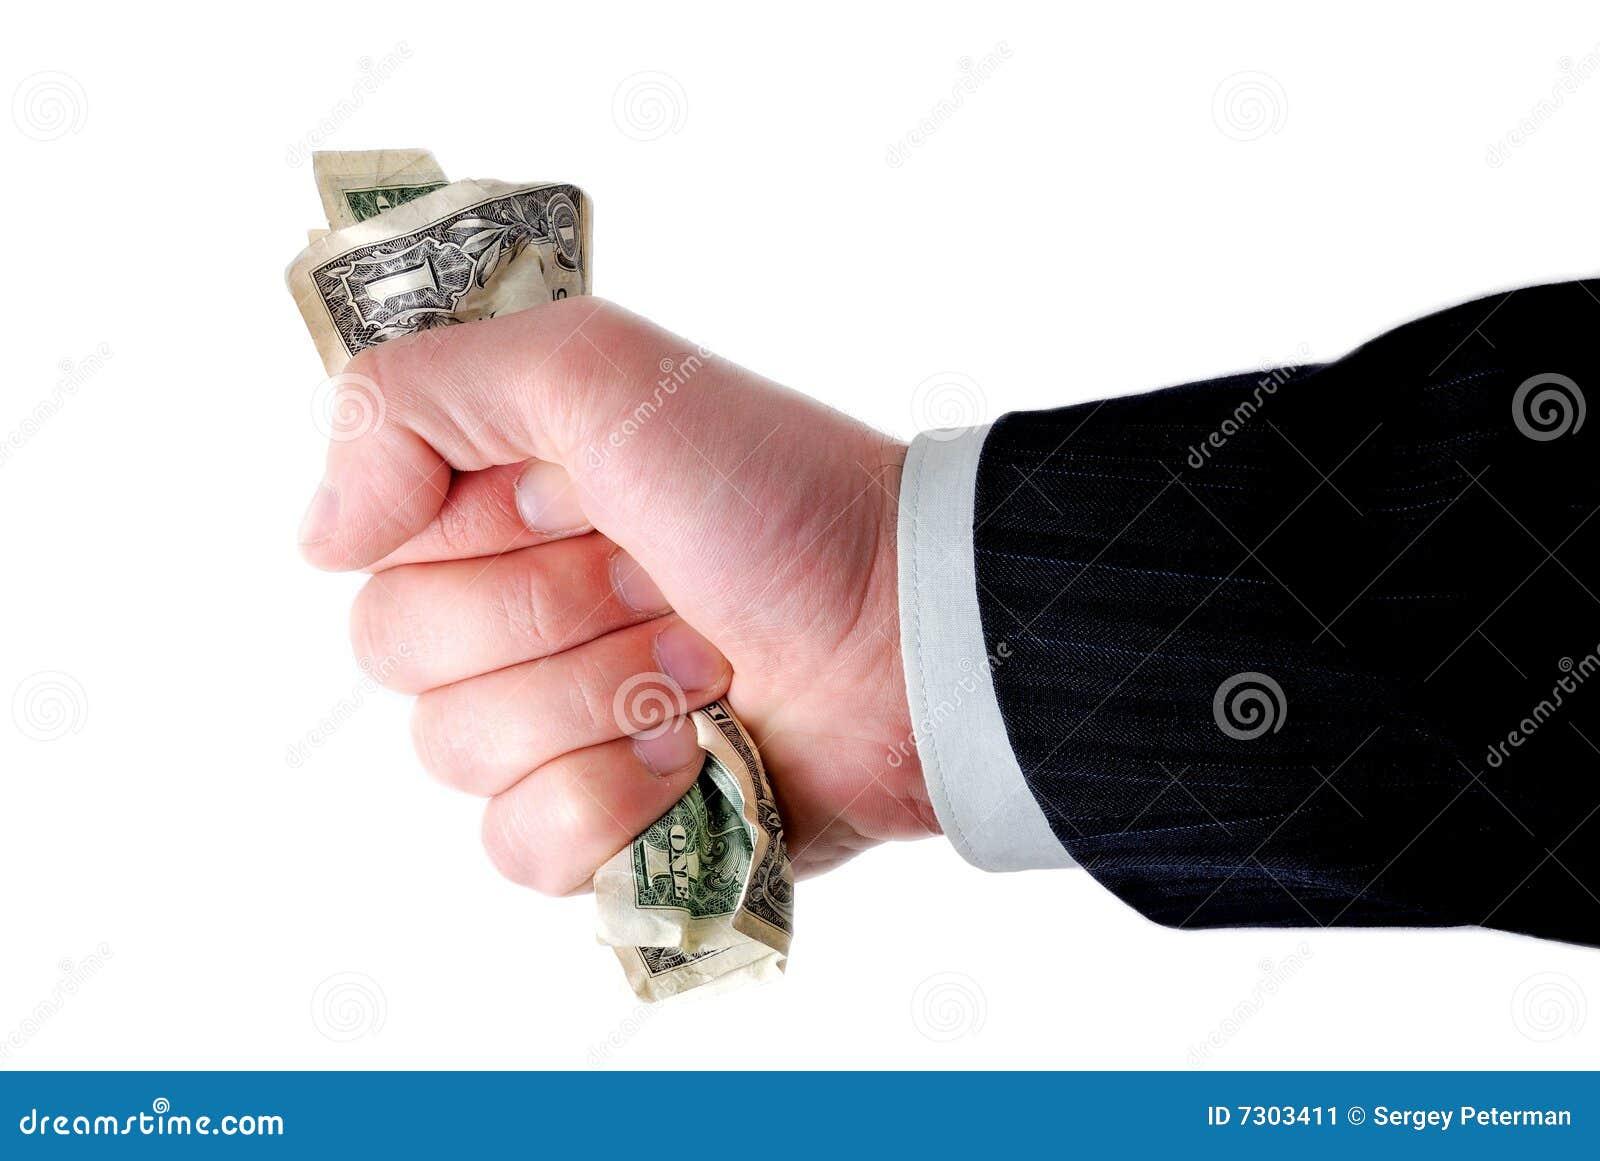 Technology Management Image: Hand Of A Businessman Holding Cash Stock Image